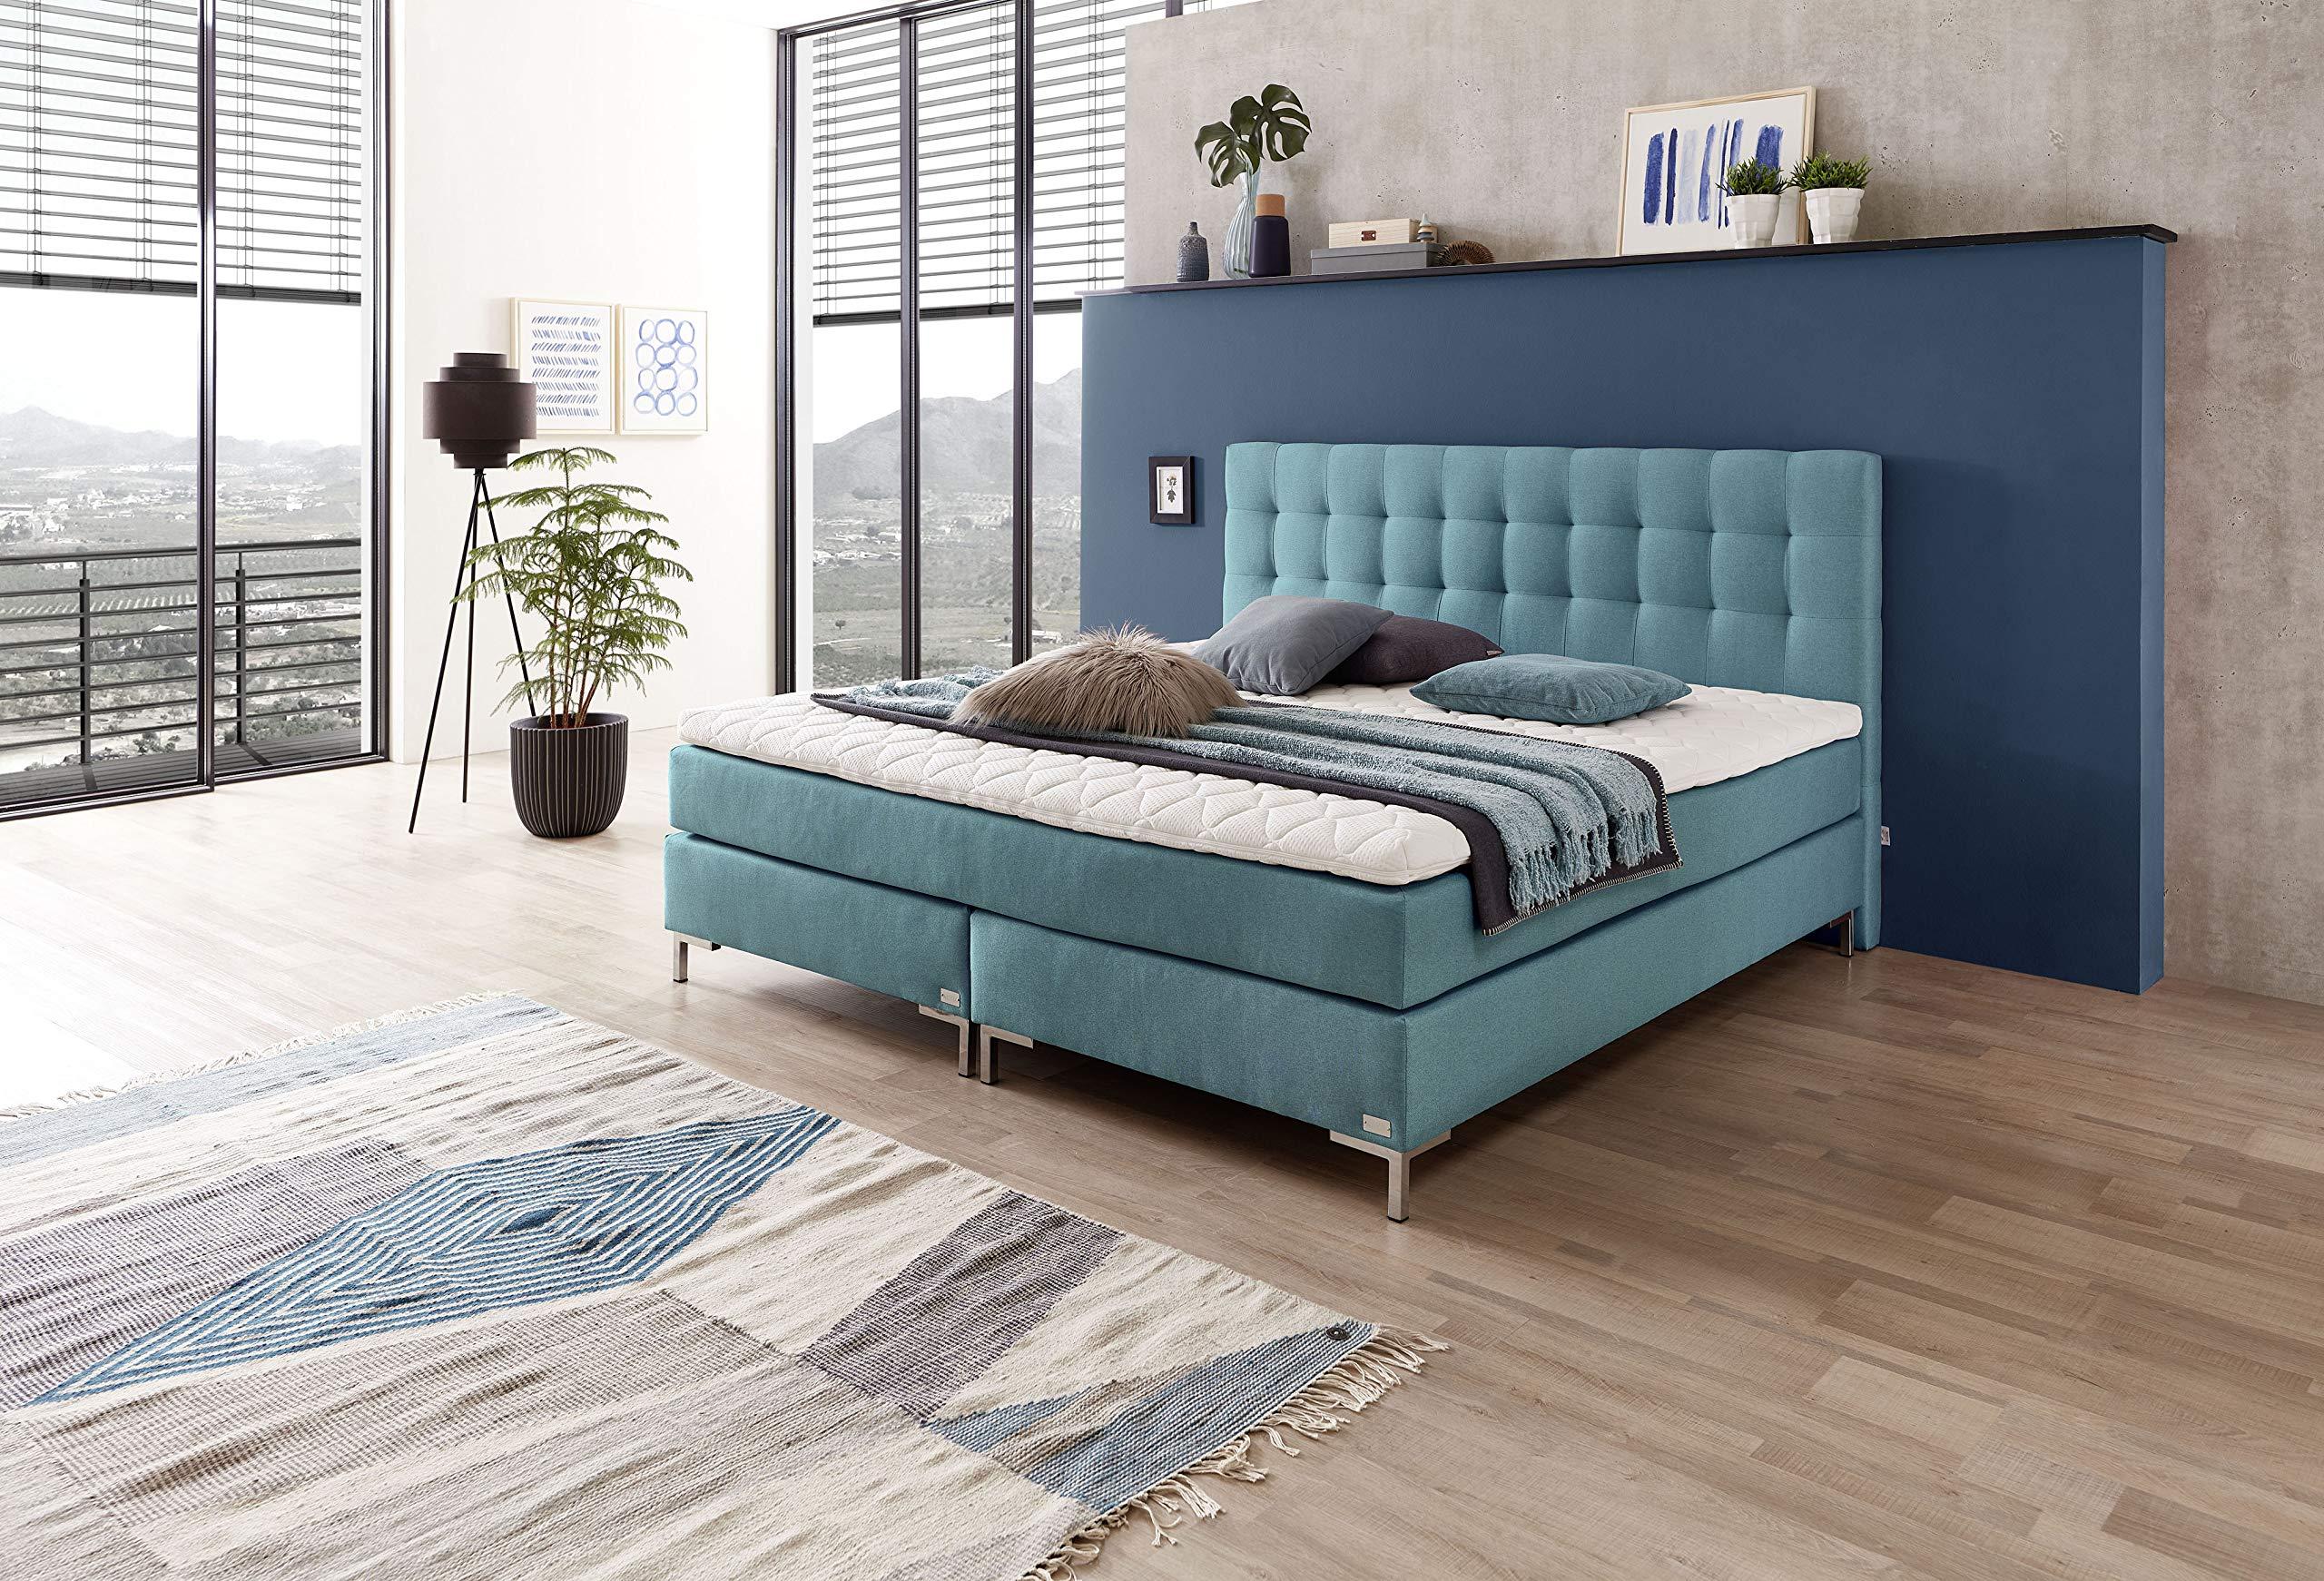 Schones Bett Aus Pure Velvet Gunstig Kaufen Samtmobel